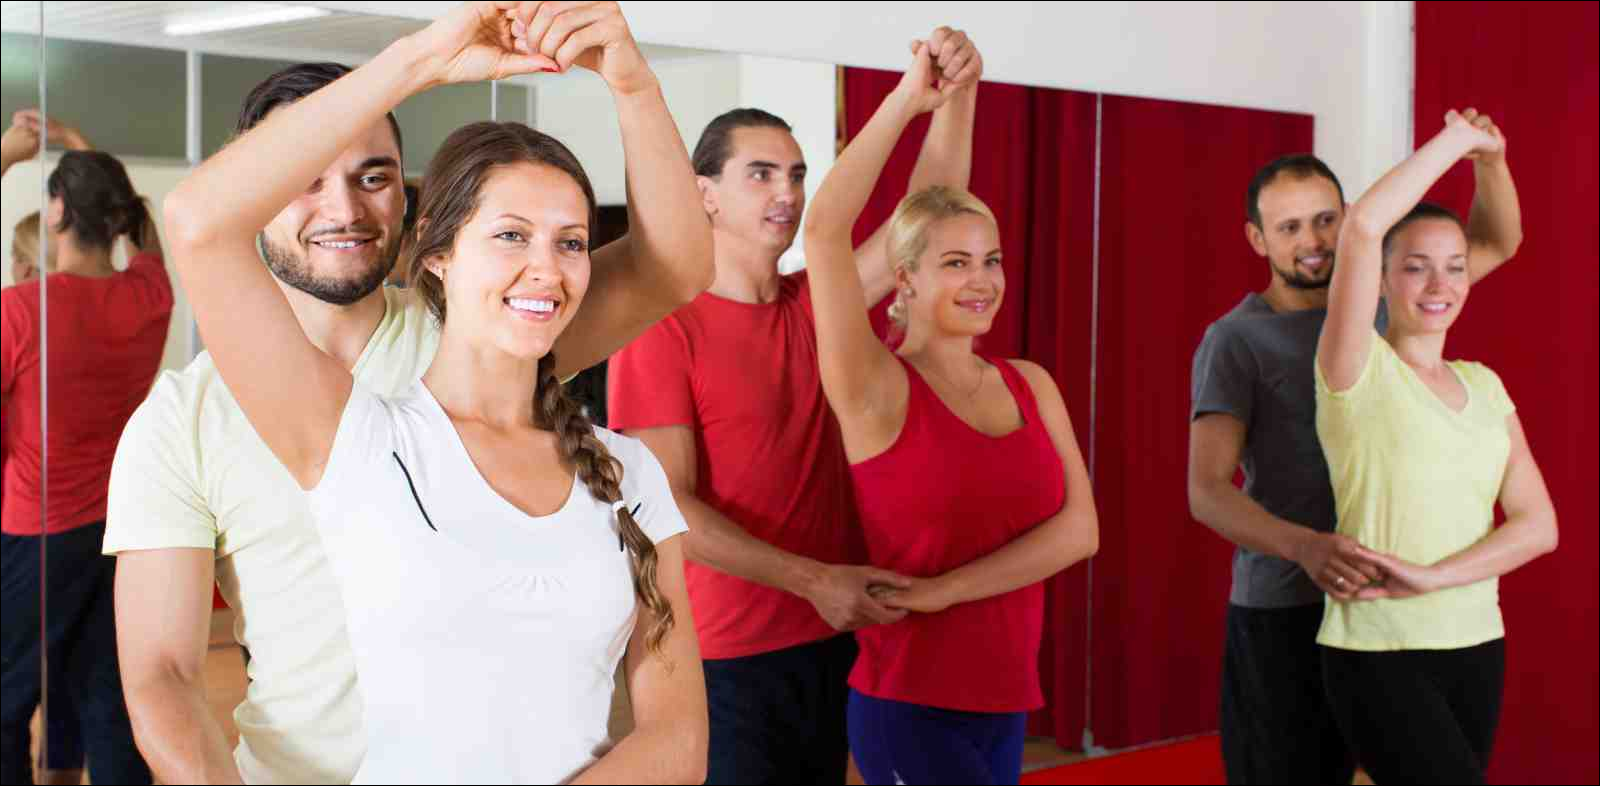 Group of adults dancing salsa in studio